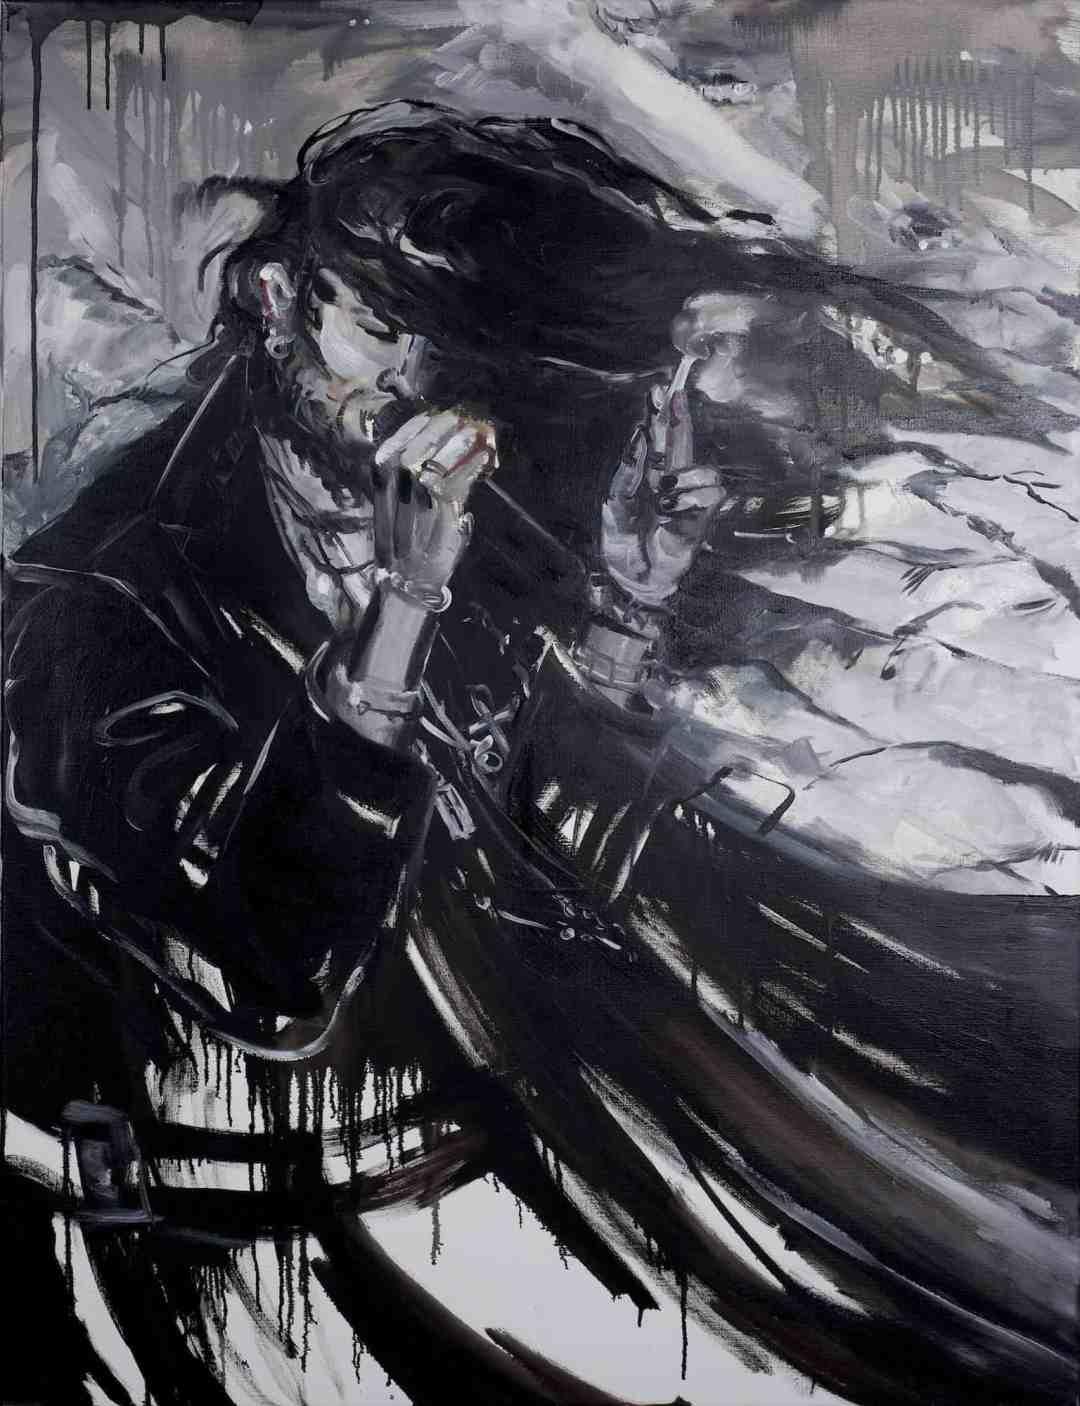 Pola Dwurnik, February, oil on canvas, 116x89cm